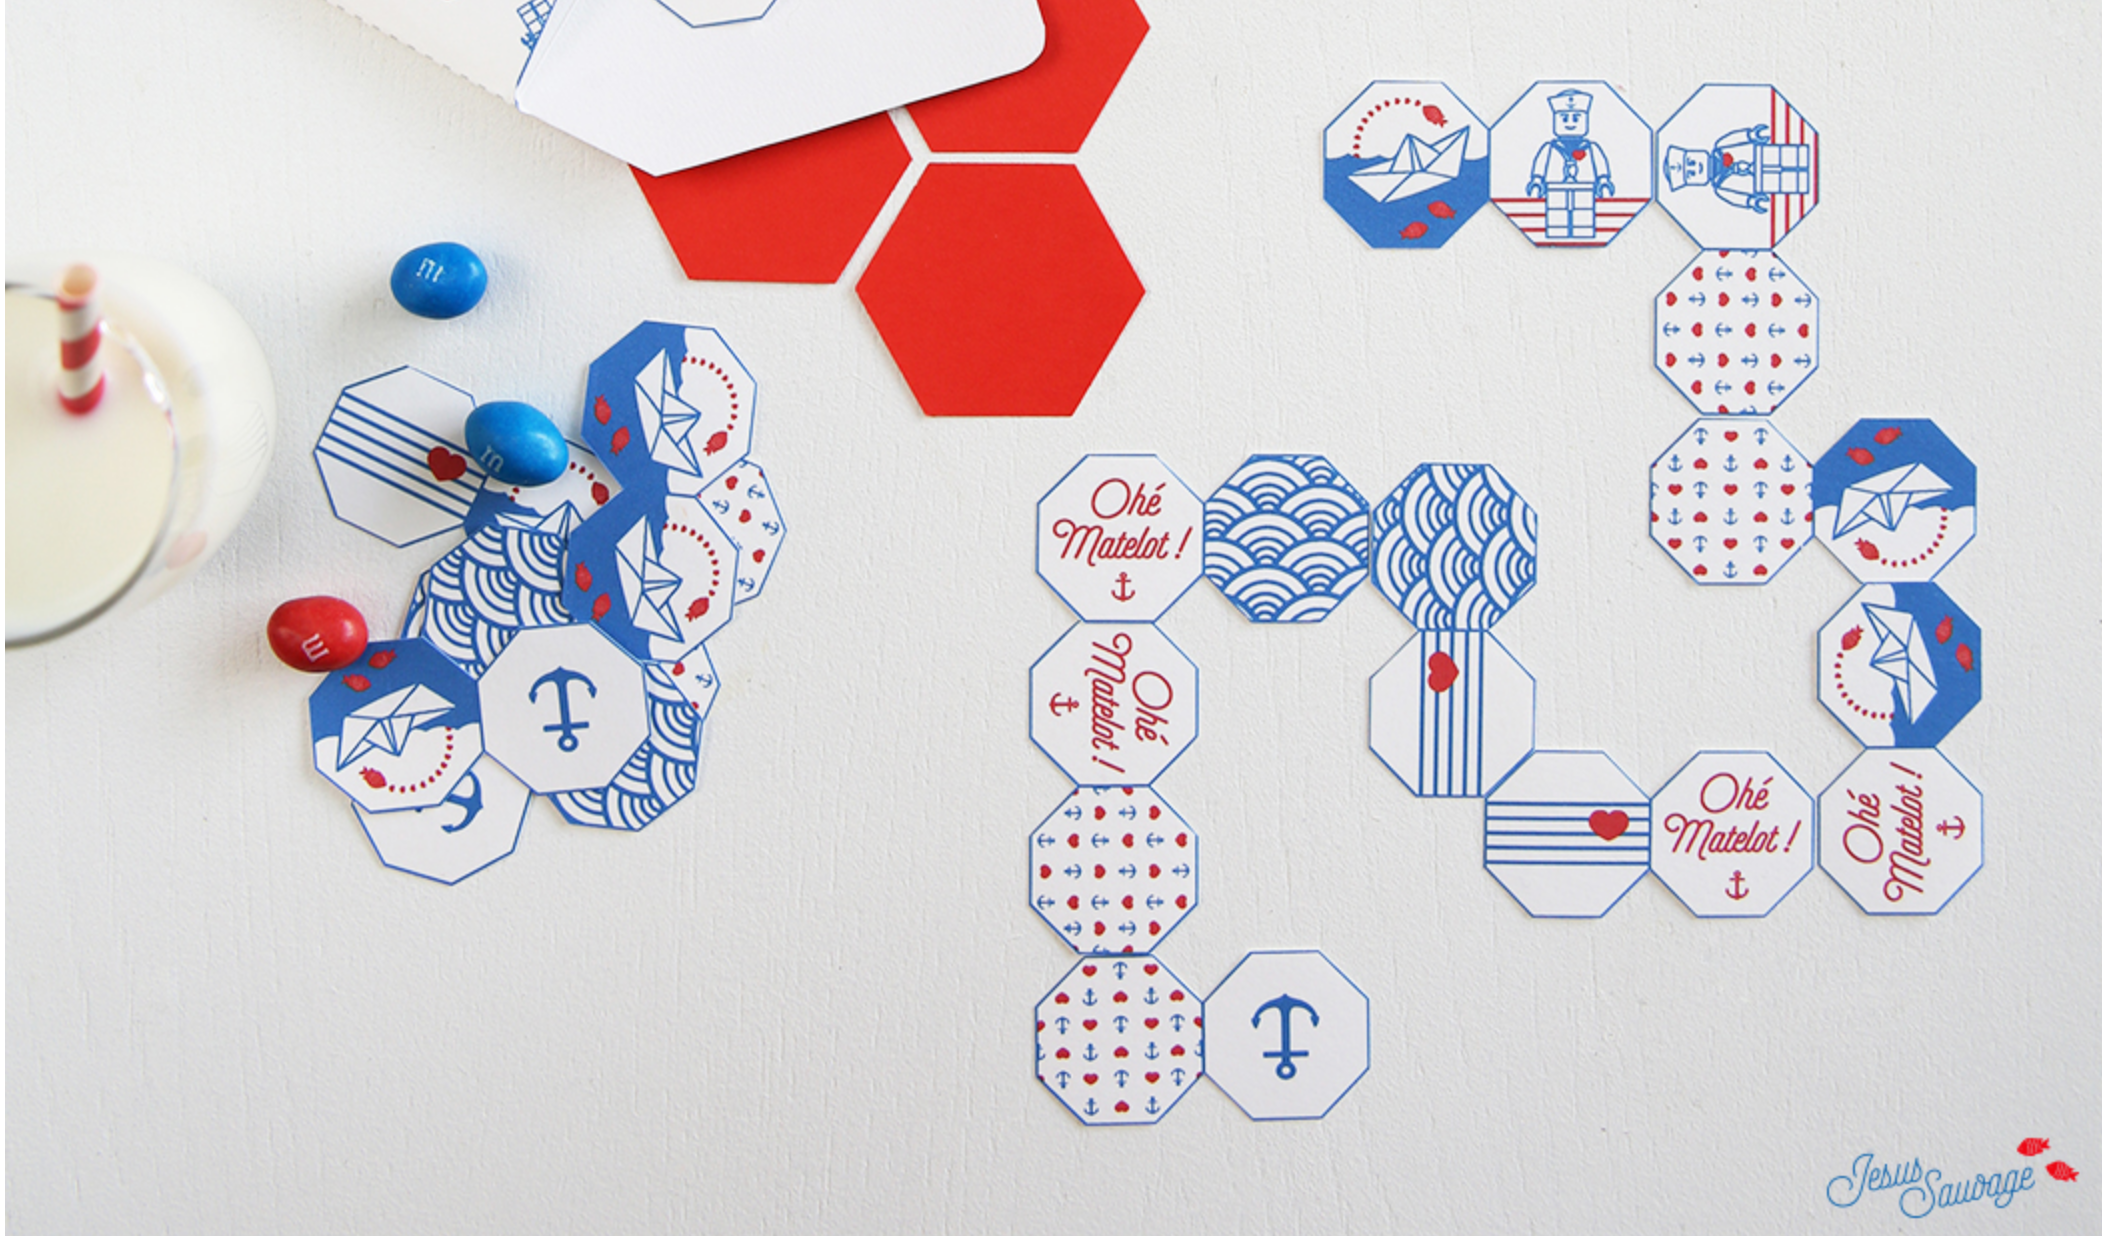 Dominos de matelot à imprimer